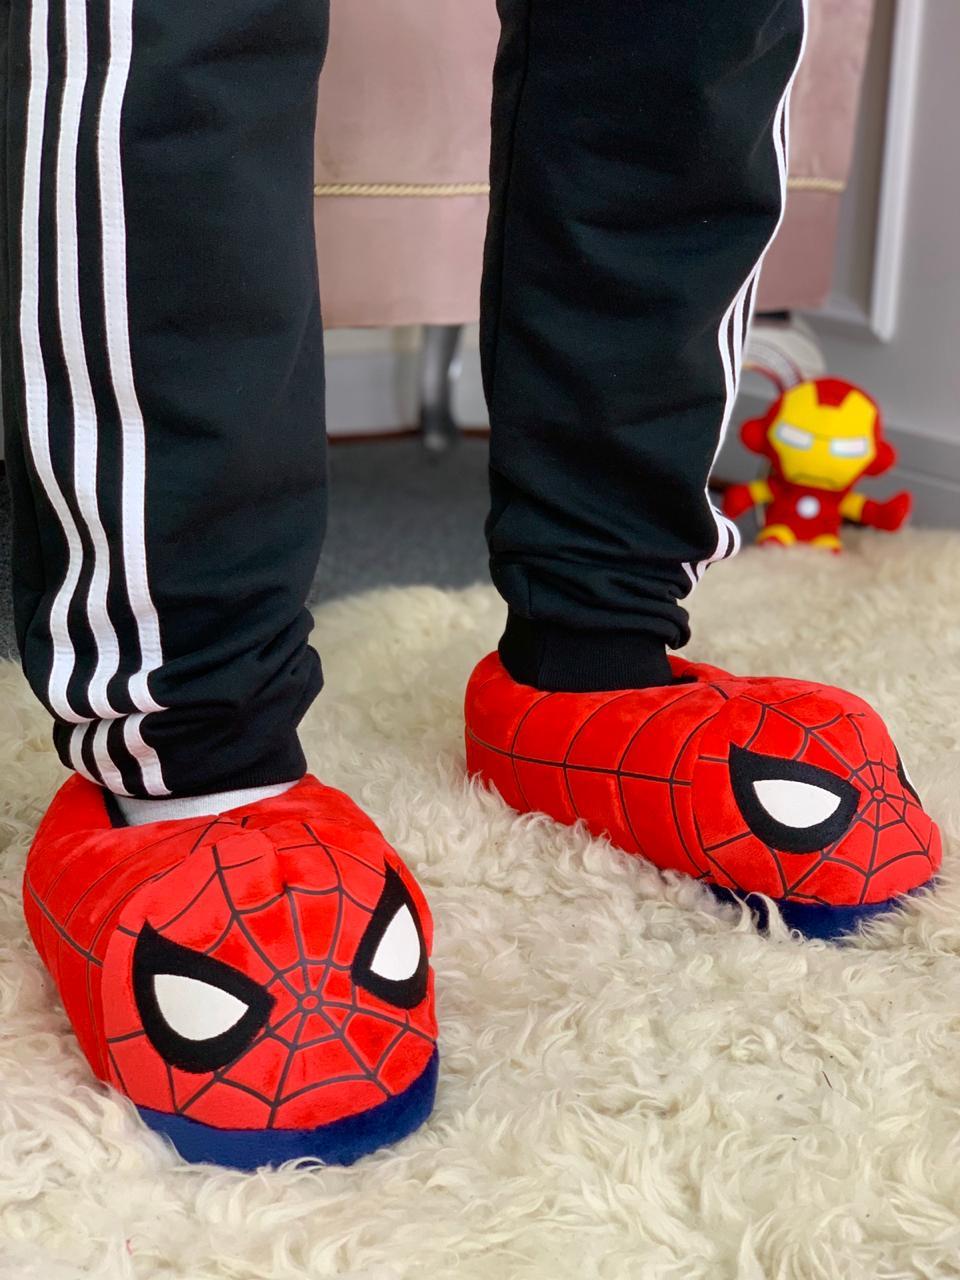 Pantufa 3D Homem Aranha (Spider-Man) Marvel - Zona Criativa